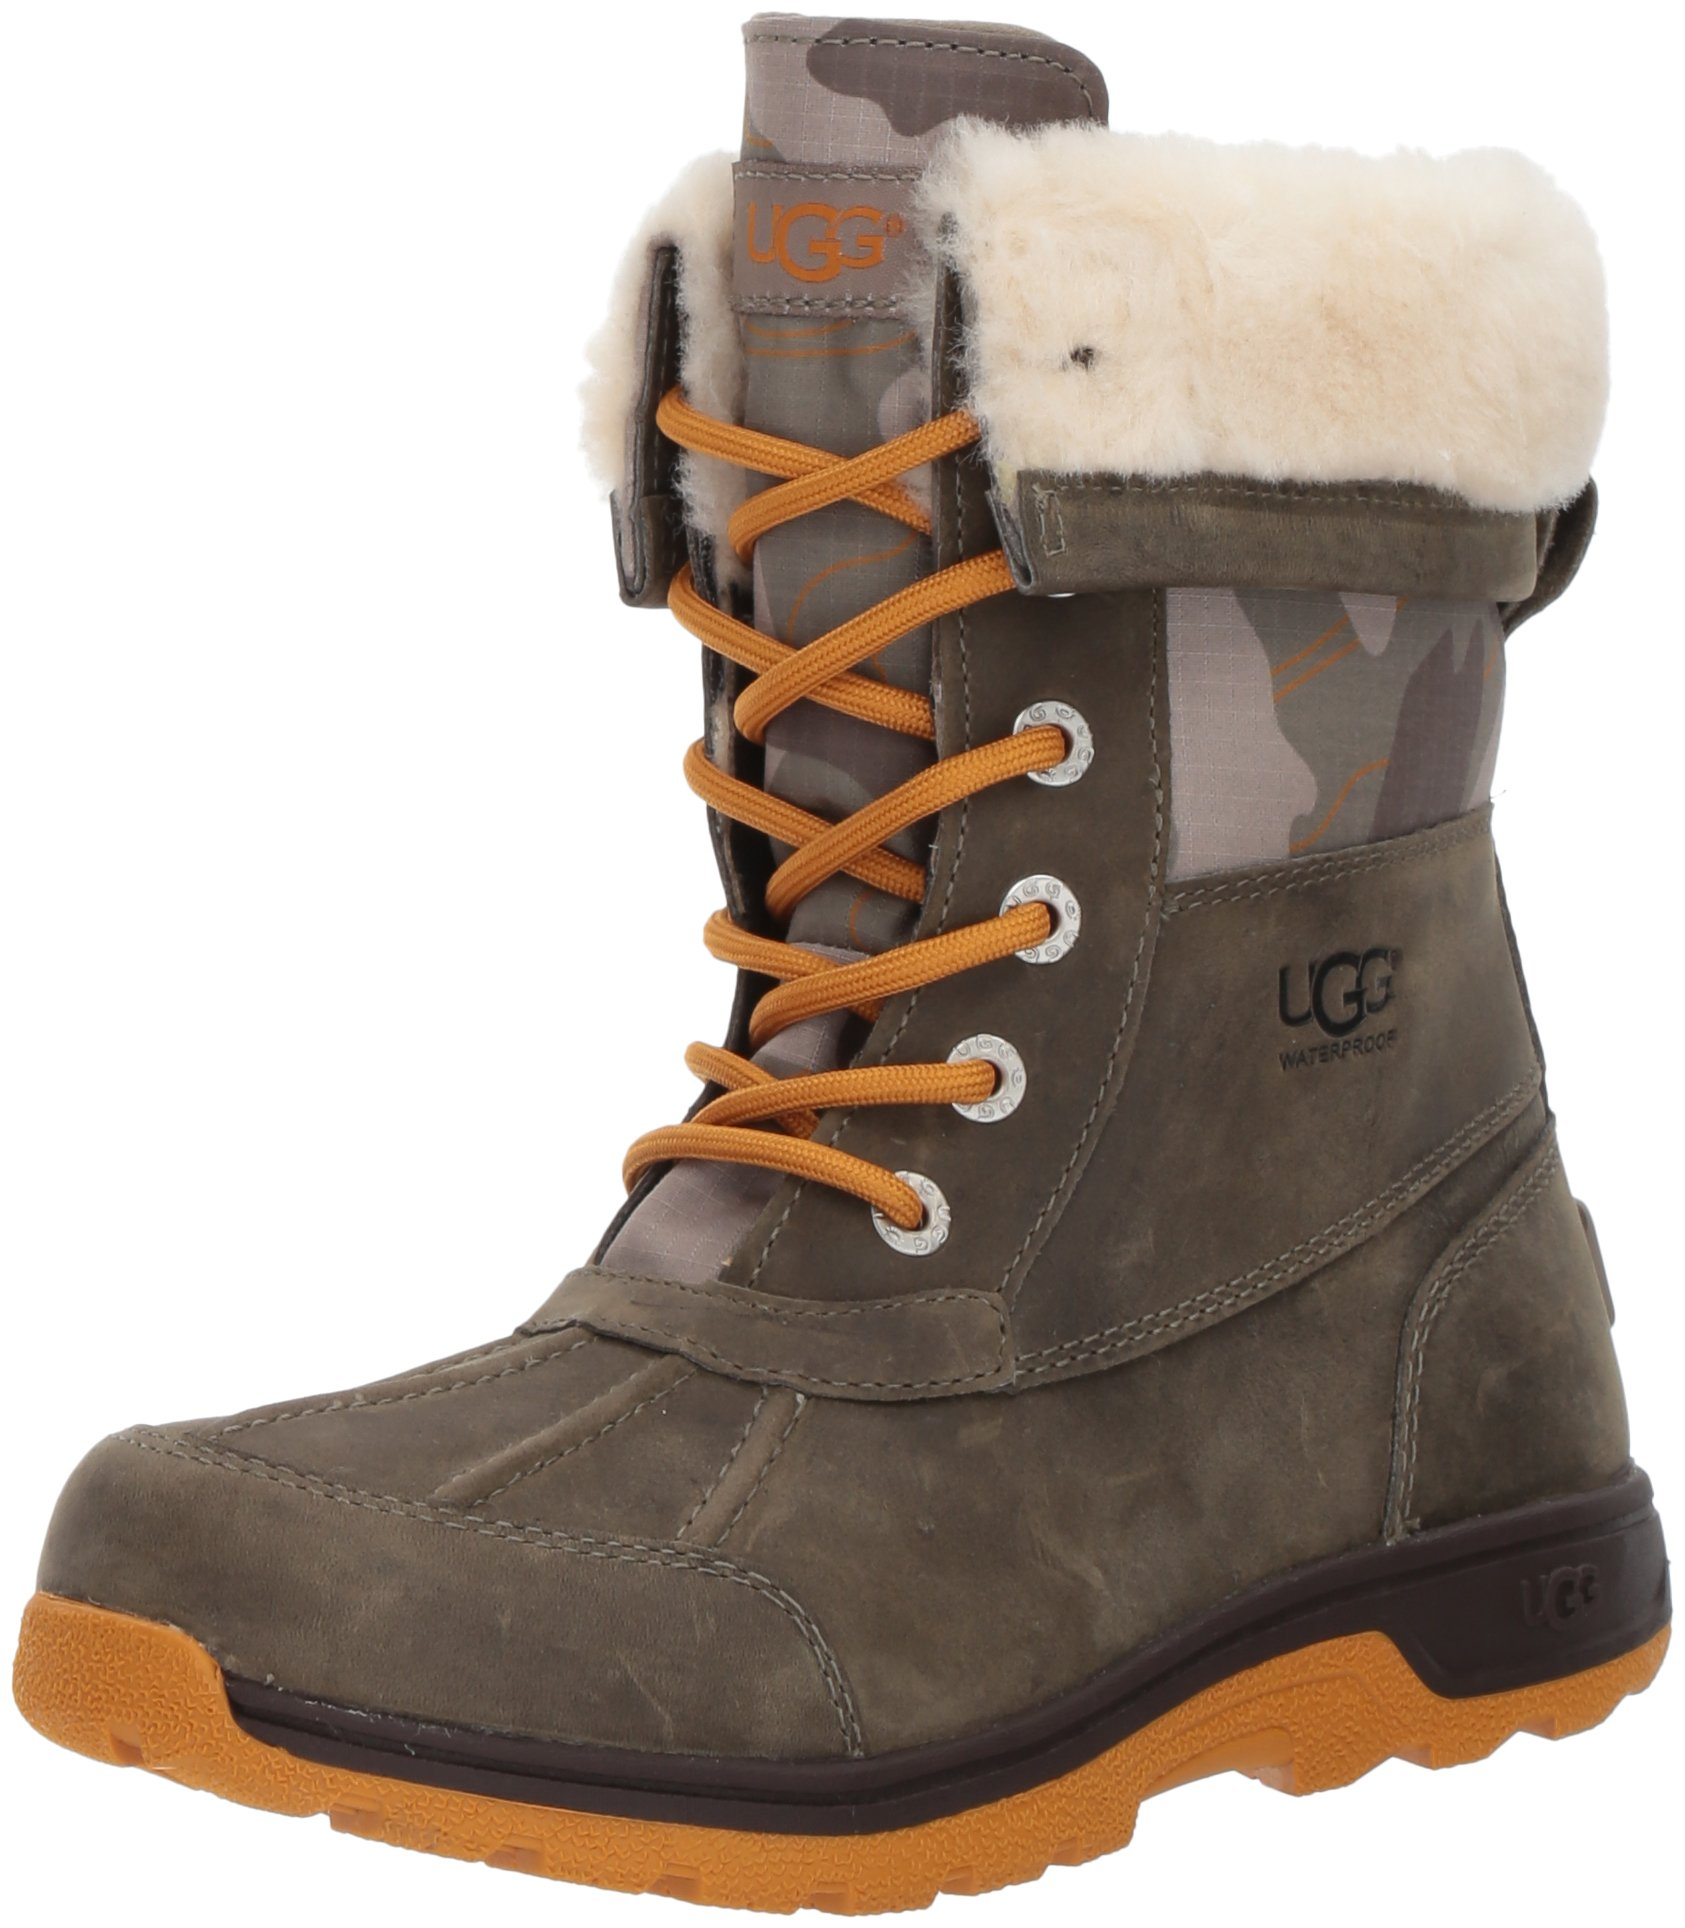 UGG Kids K Butte II Camo Lace-up Boot, Brindle, 5 M US Big Kid